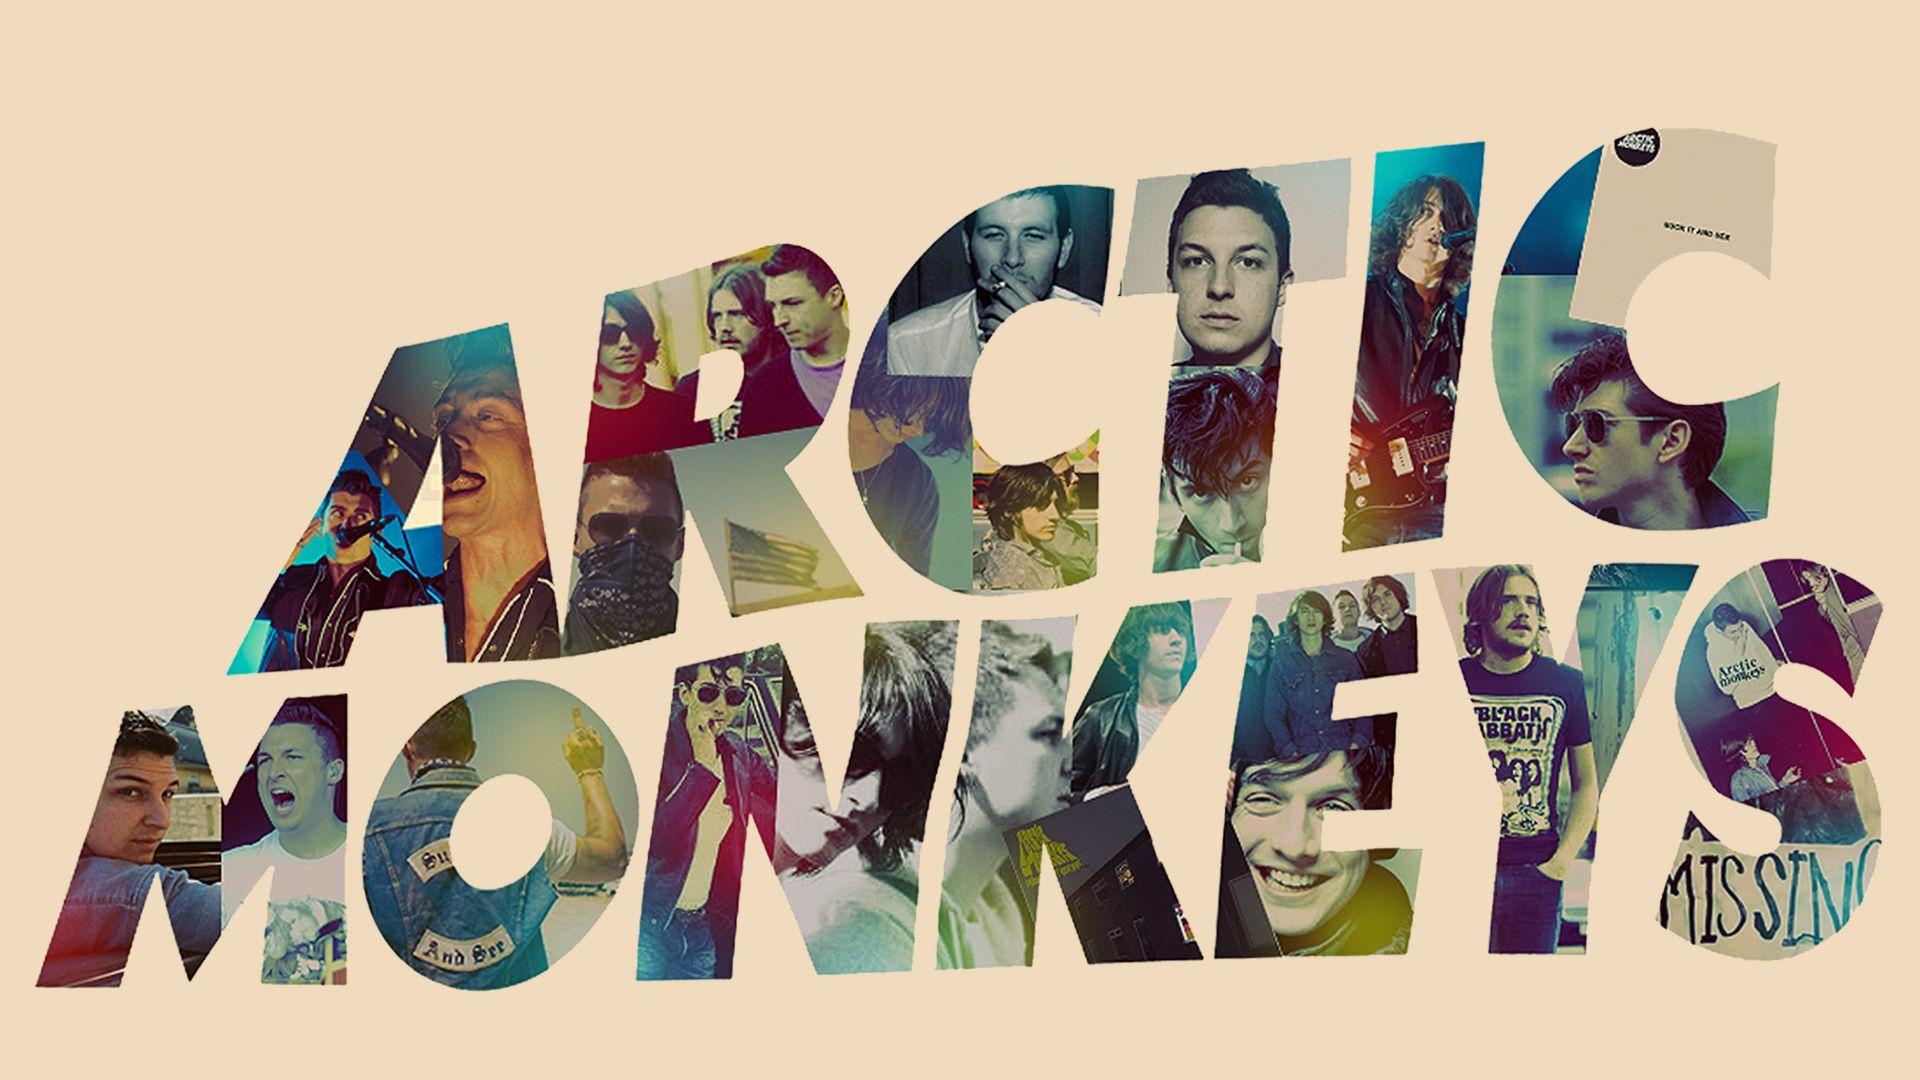 22 Arctic Monkeys Hd Wallpapers Backgrounds Wallpaper Abyss Arctic Monkeys Wallpaper Arctic Monkeys Monkey Wallpaper